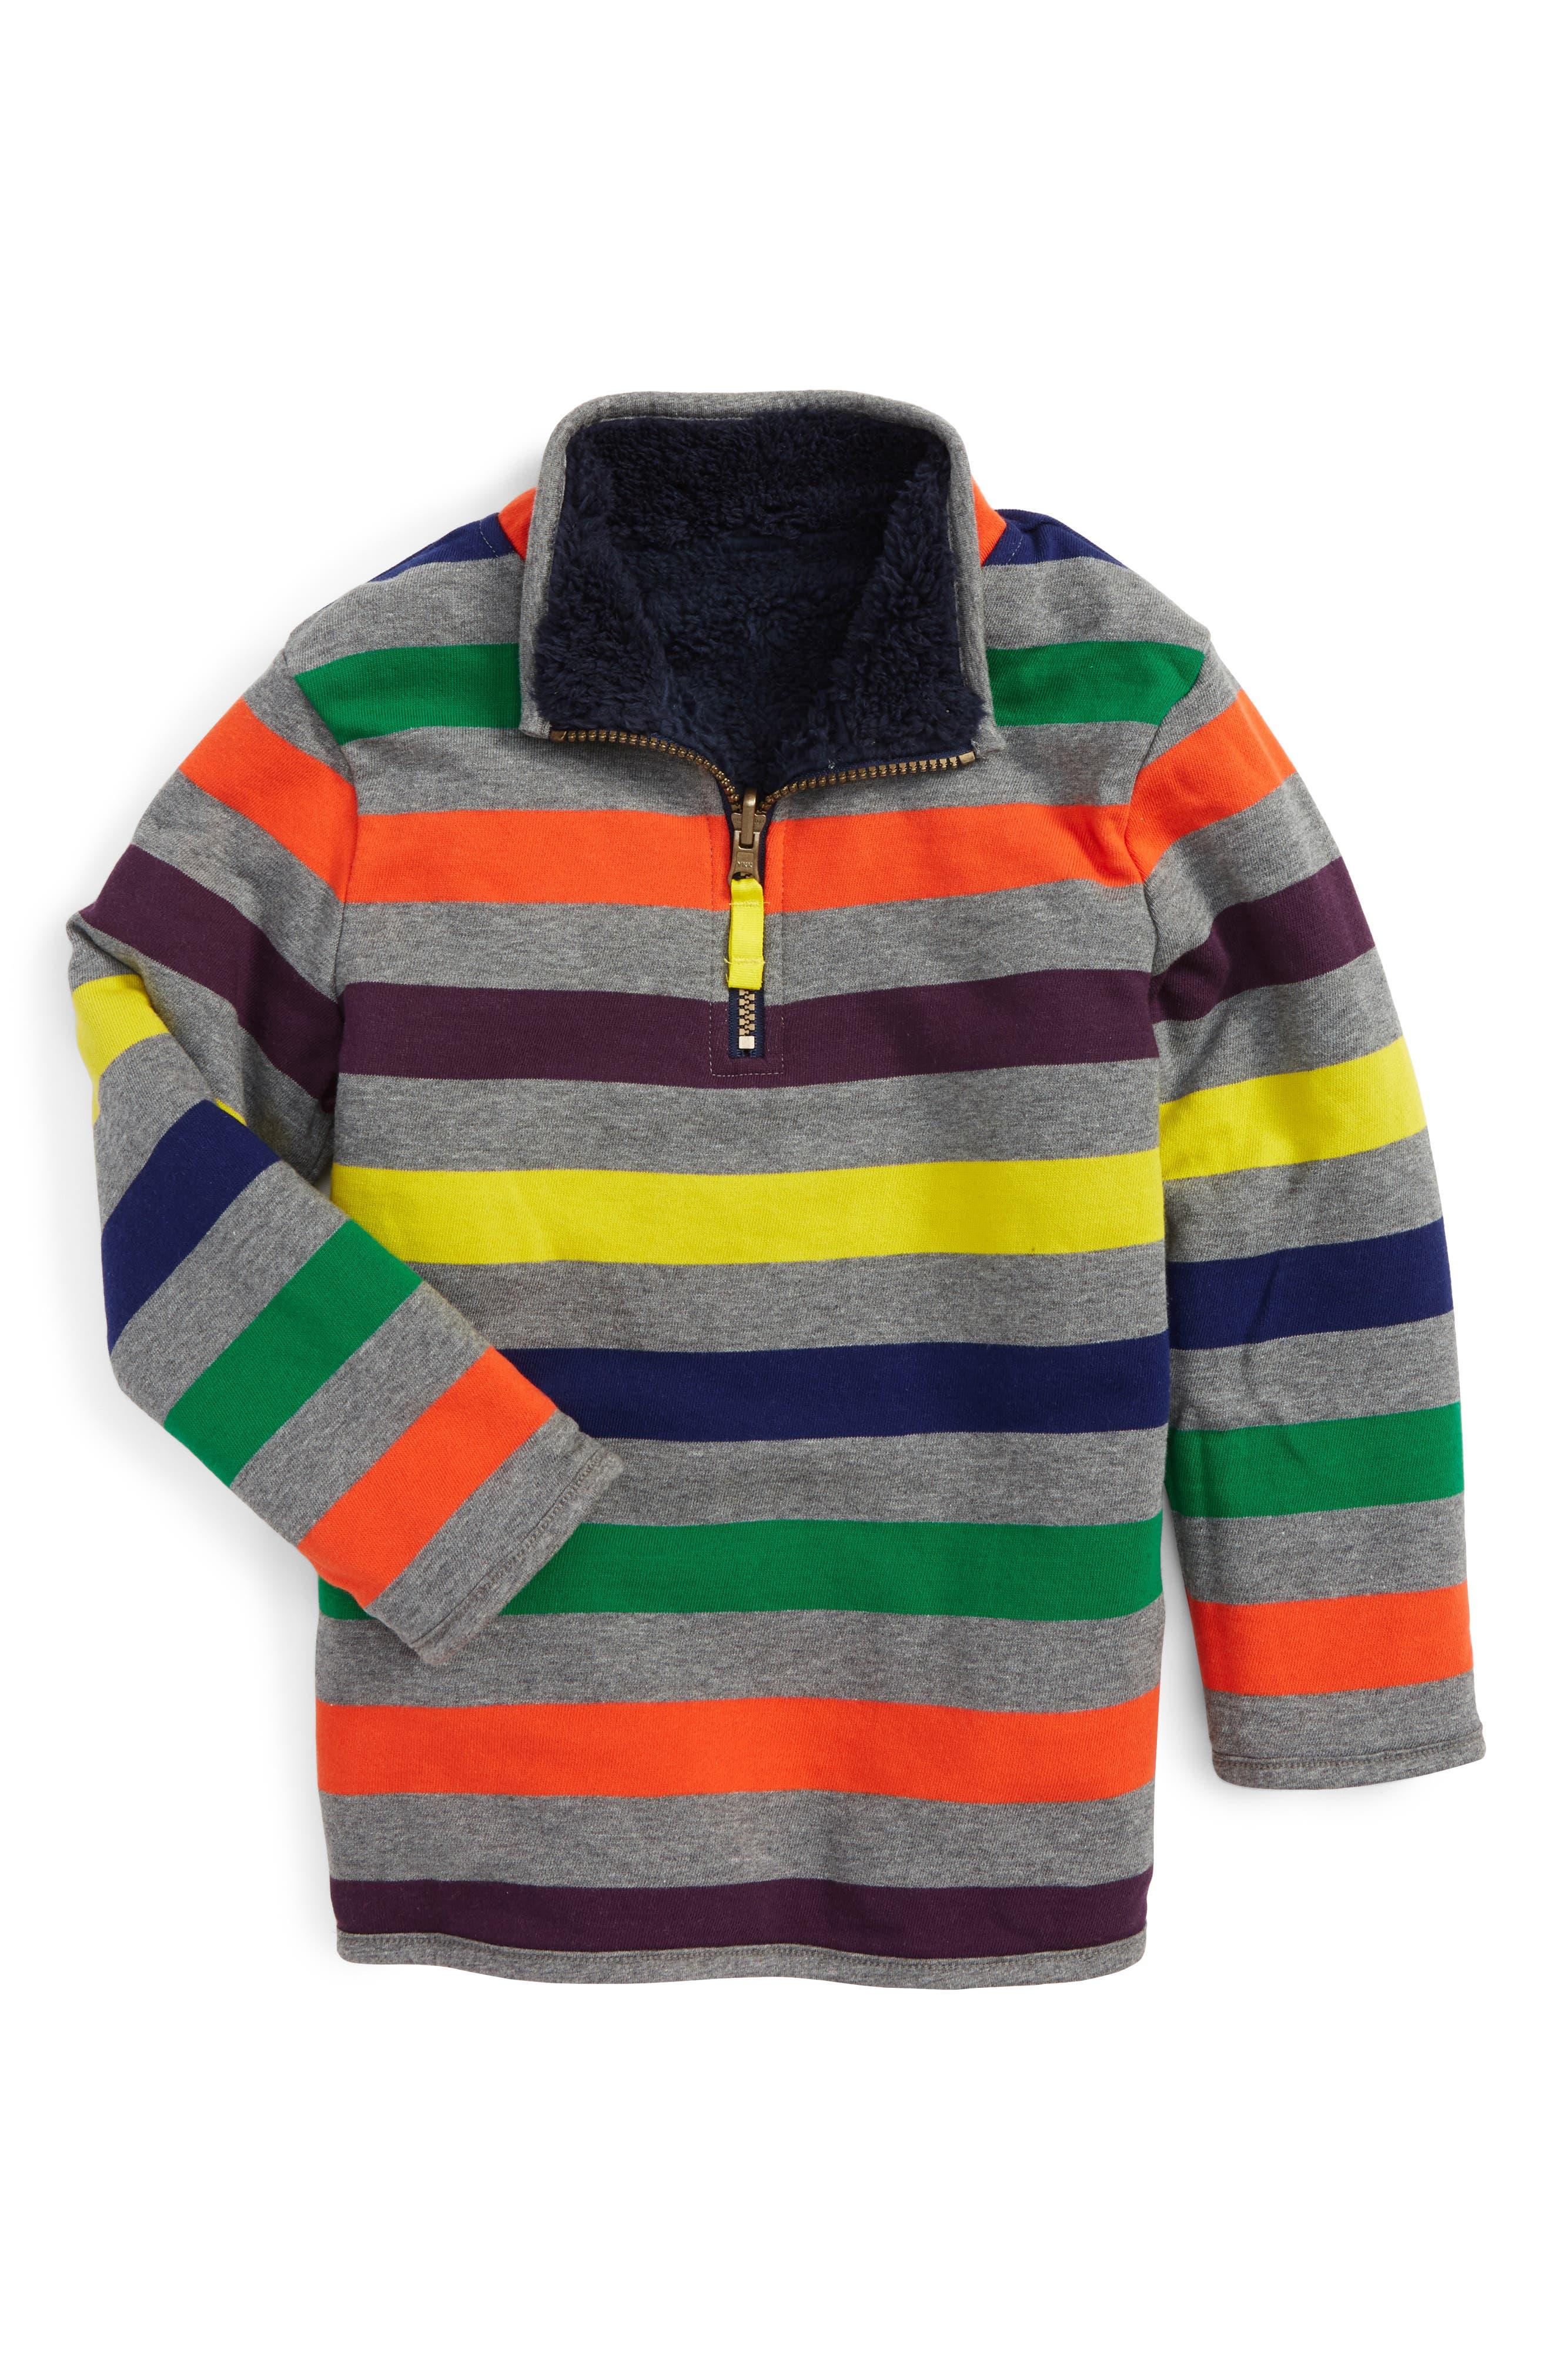 Alternate Image 2  - Mini Boden Reversible Quarter Zip Sweatshirt (Toddler Boys, Little Boys & Big Boys)